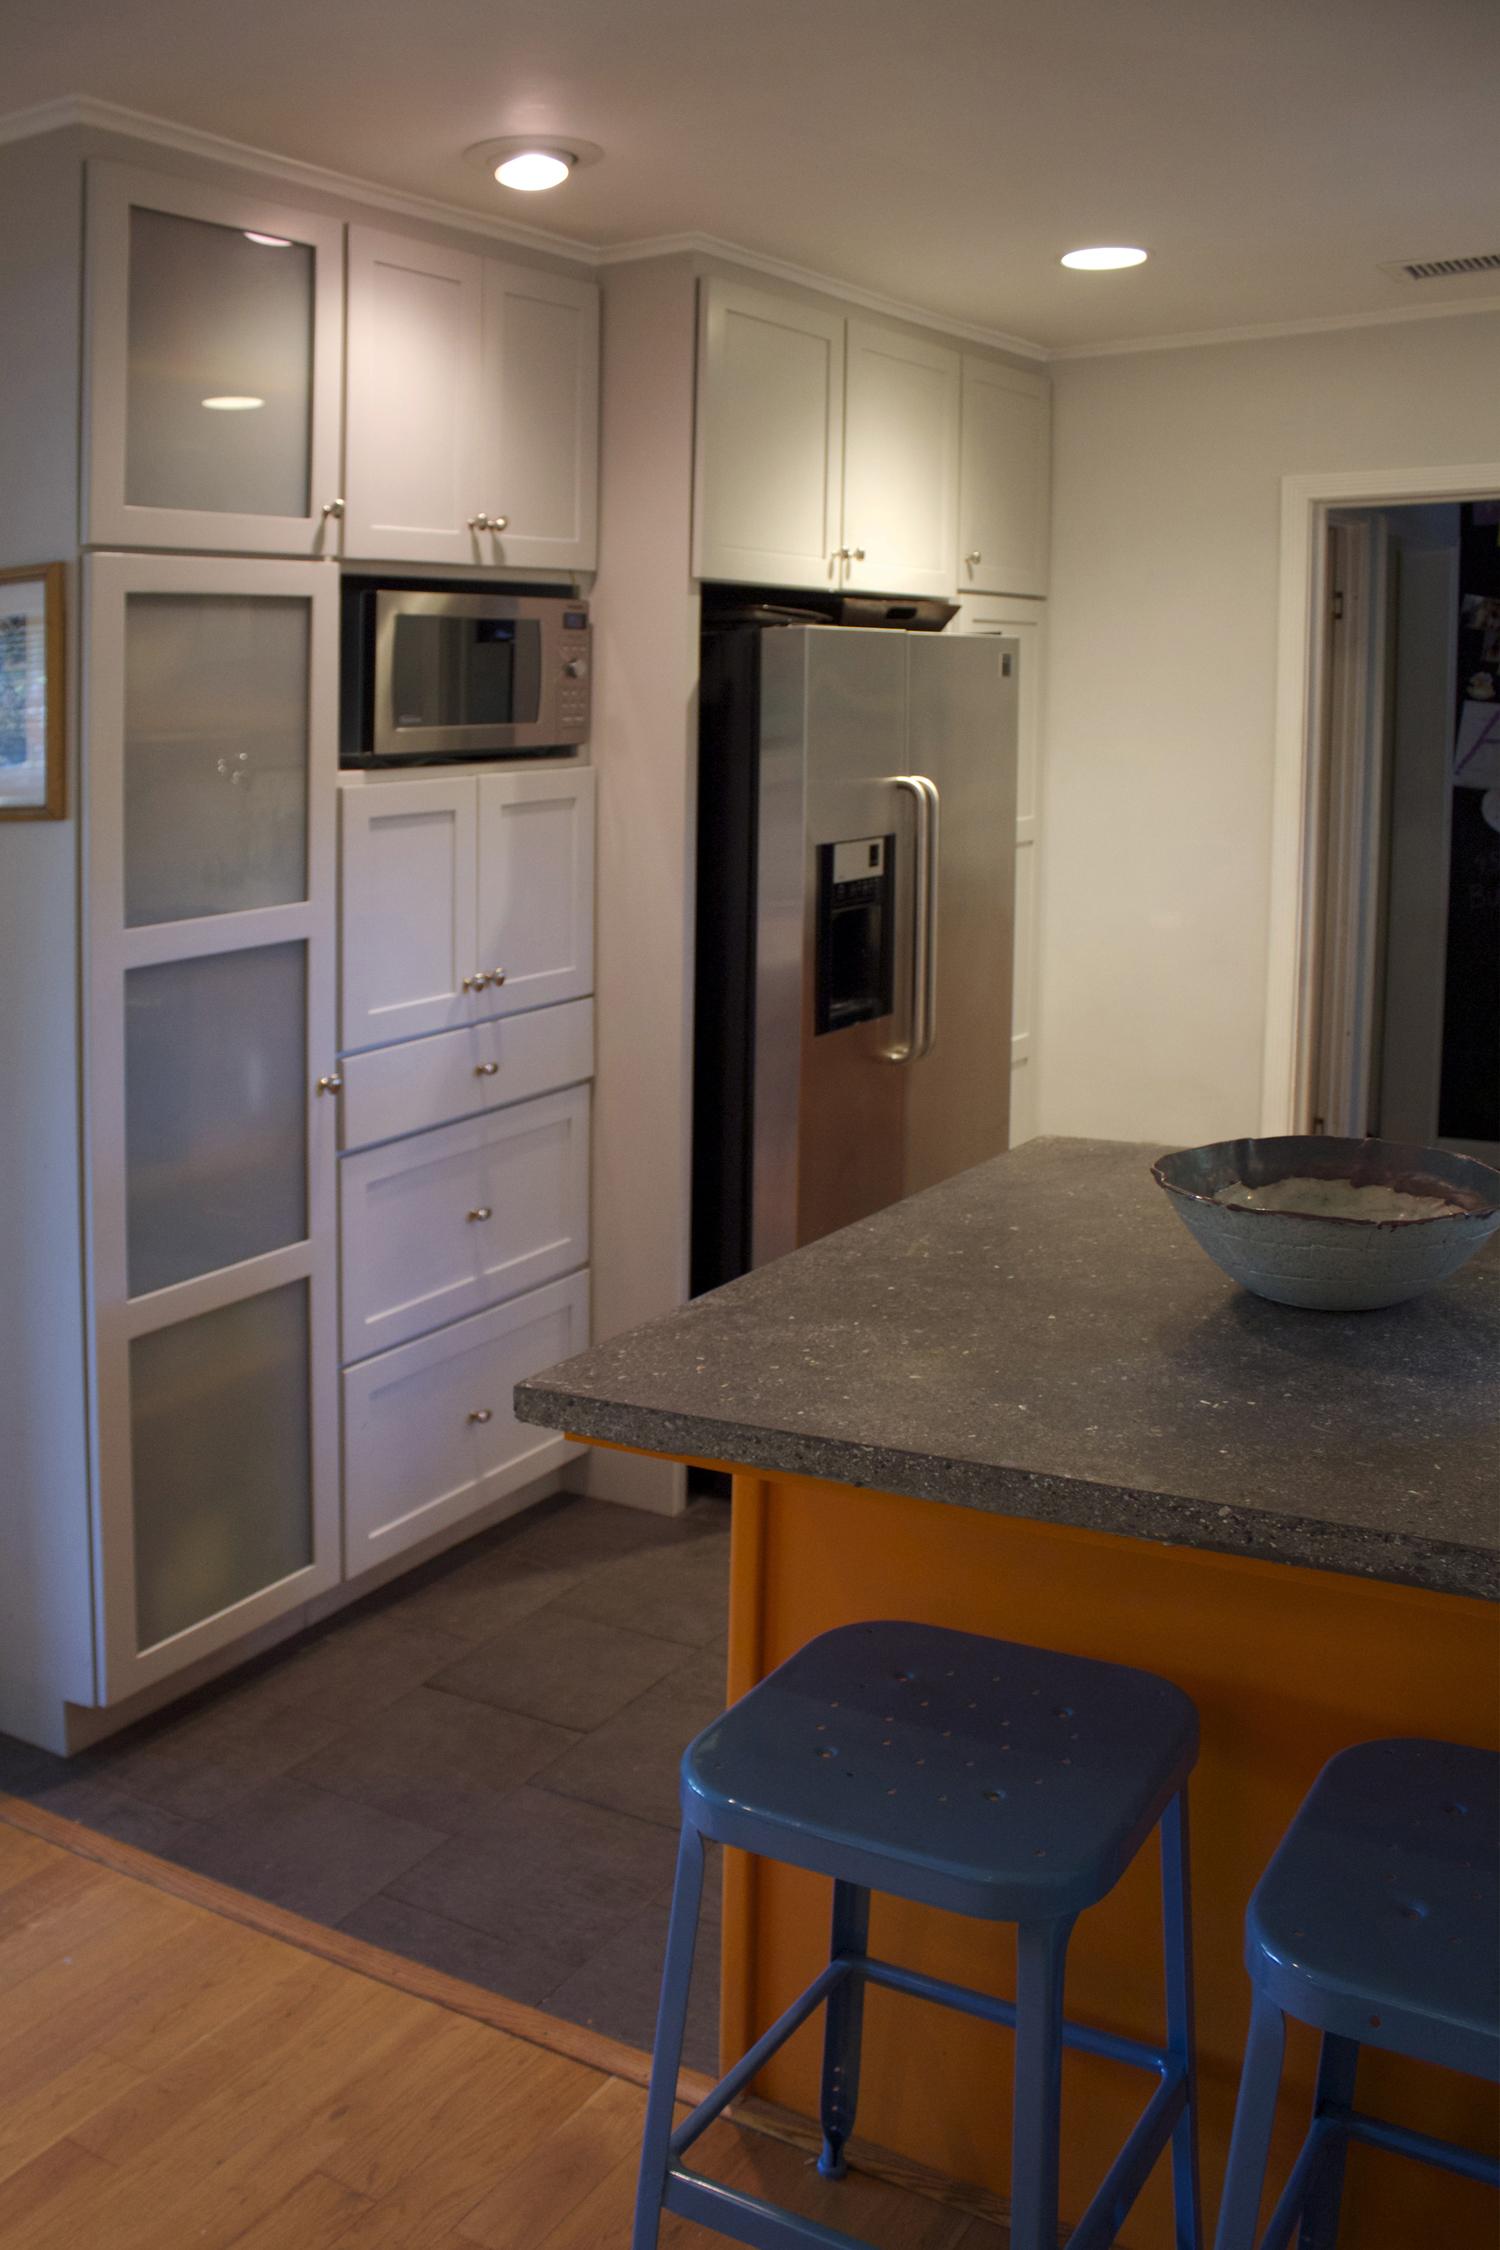 burbank kitchen4small.jpg